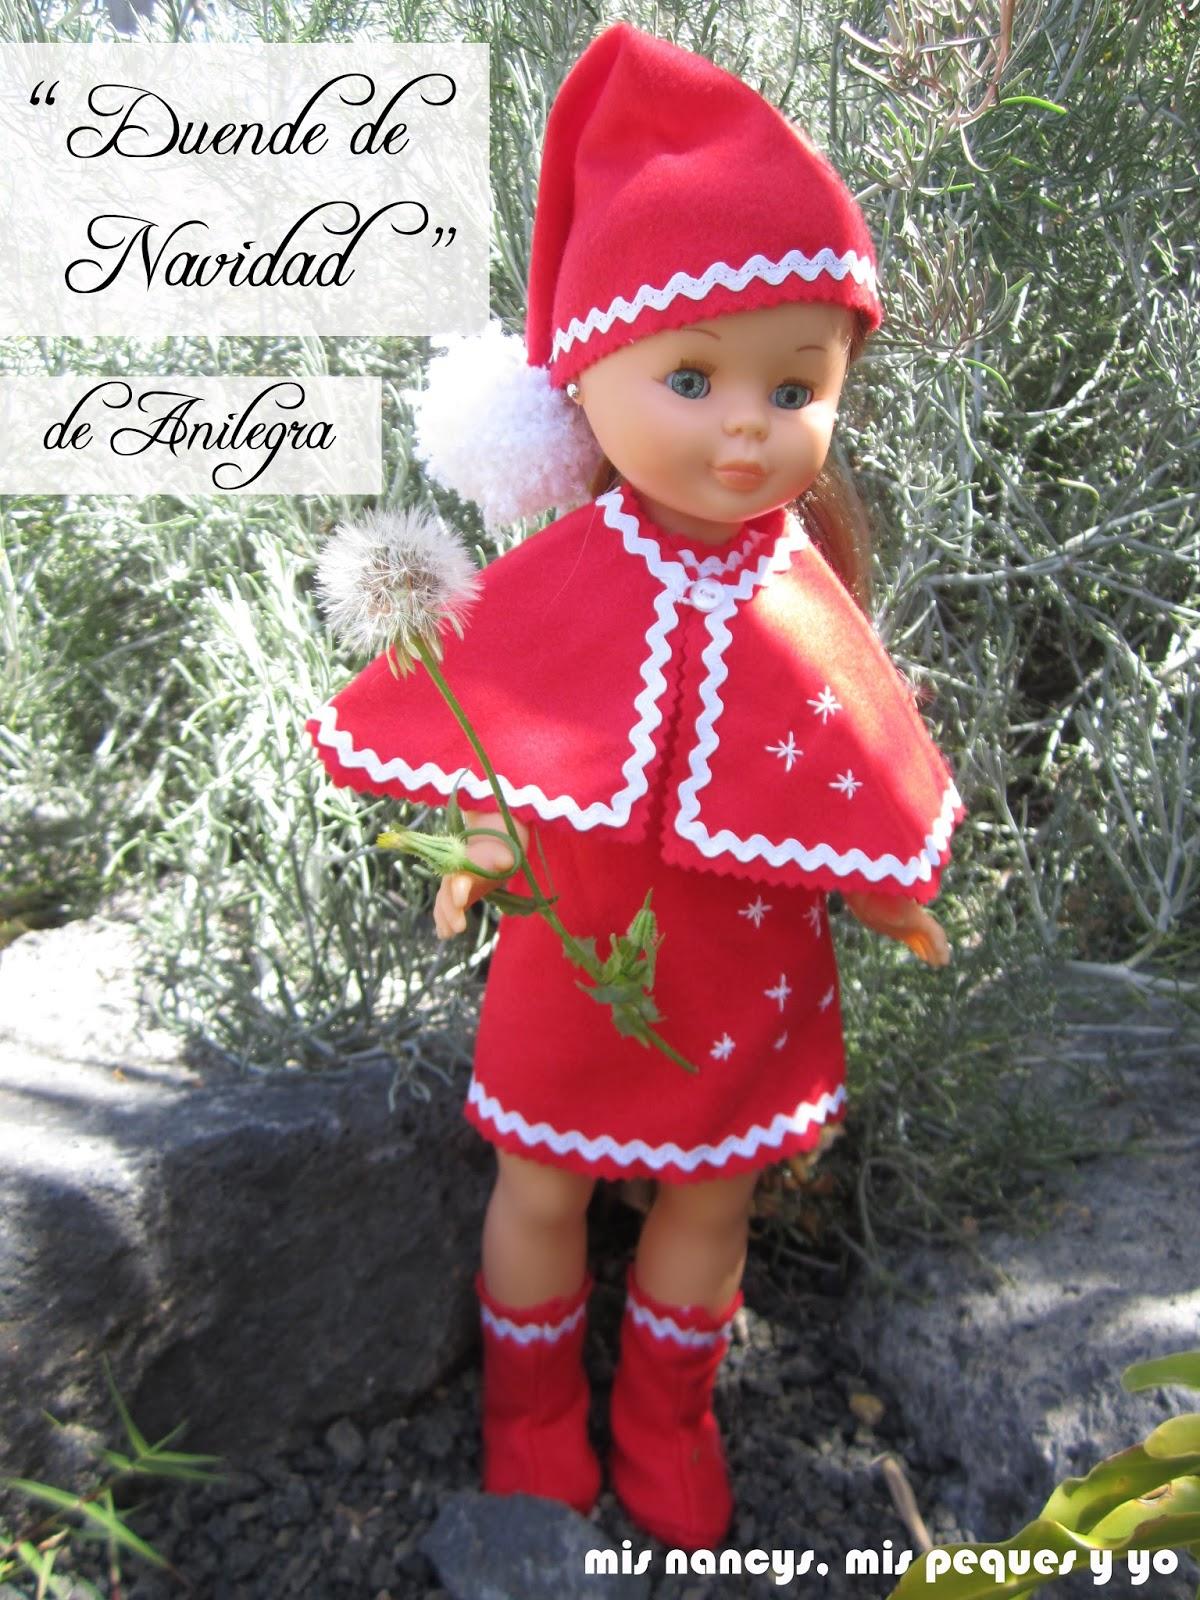 Disfraz «Duende de Navidad» de Anilegra para Nancy